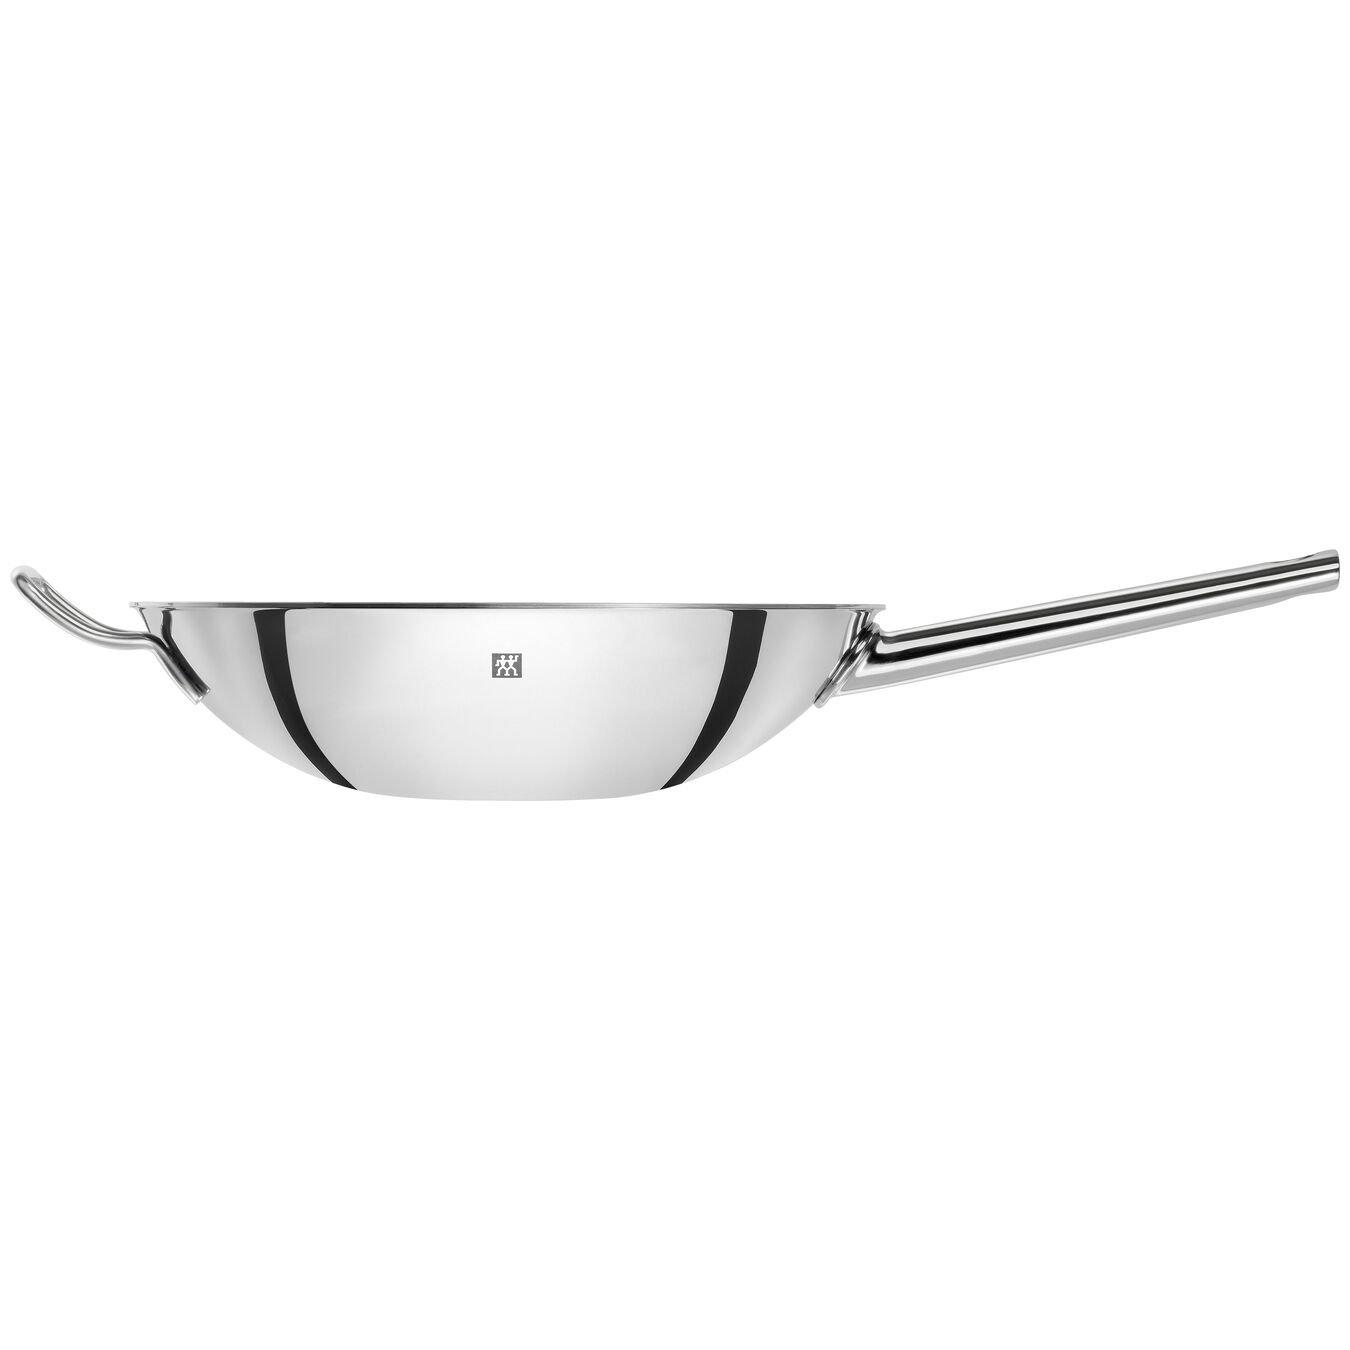 Wok - 32 cm, 18/10 acciaio inossidabile, Ceraforce Ultra,,large 5